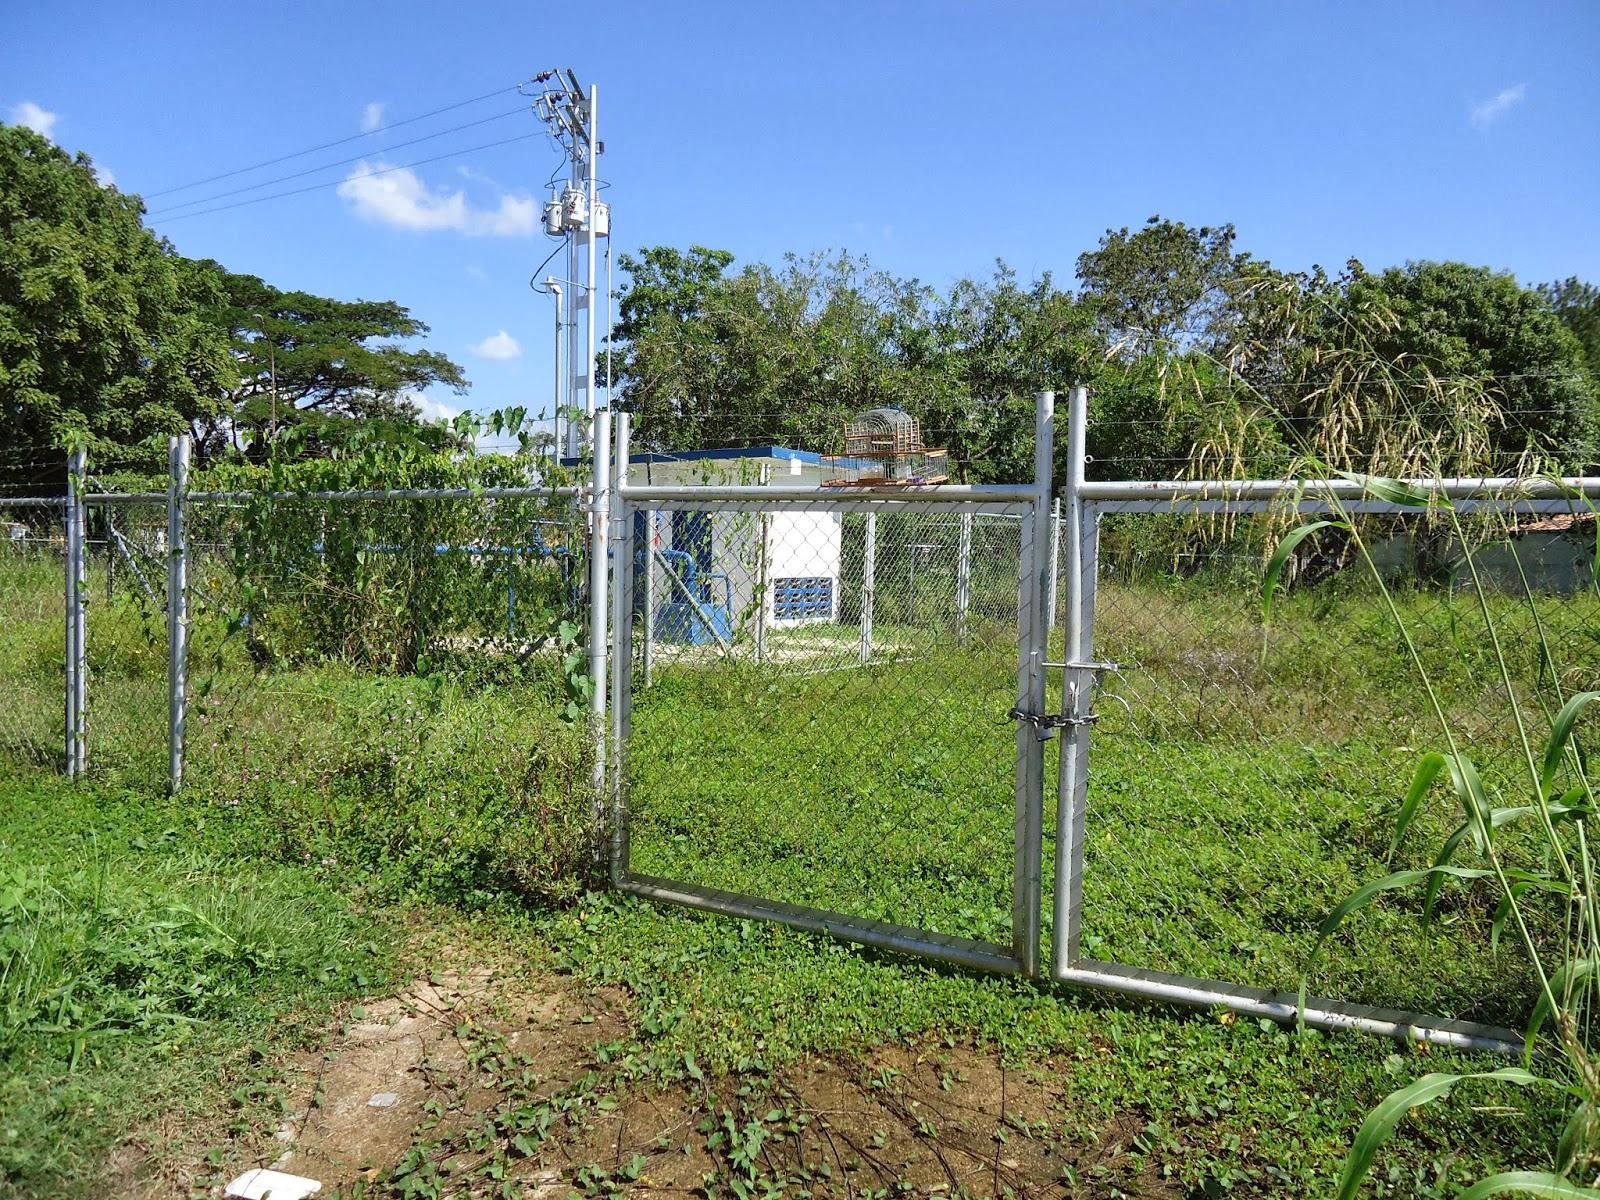 Jard n bamb c a aecom texaco urbanizaci n el molino for Jardin bambu